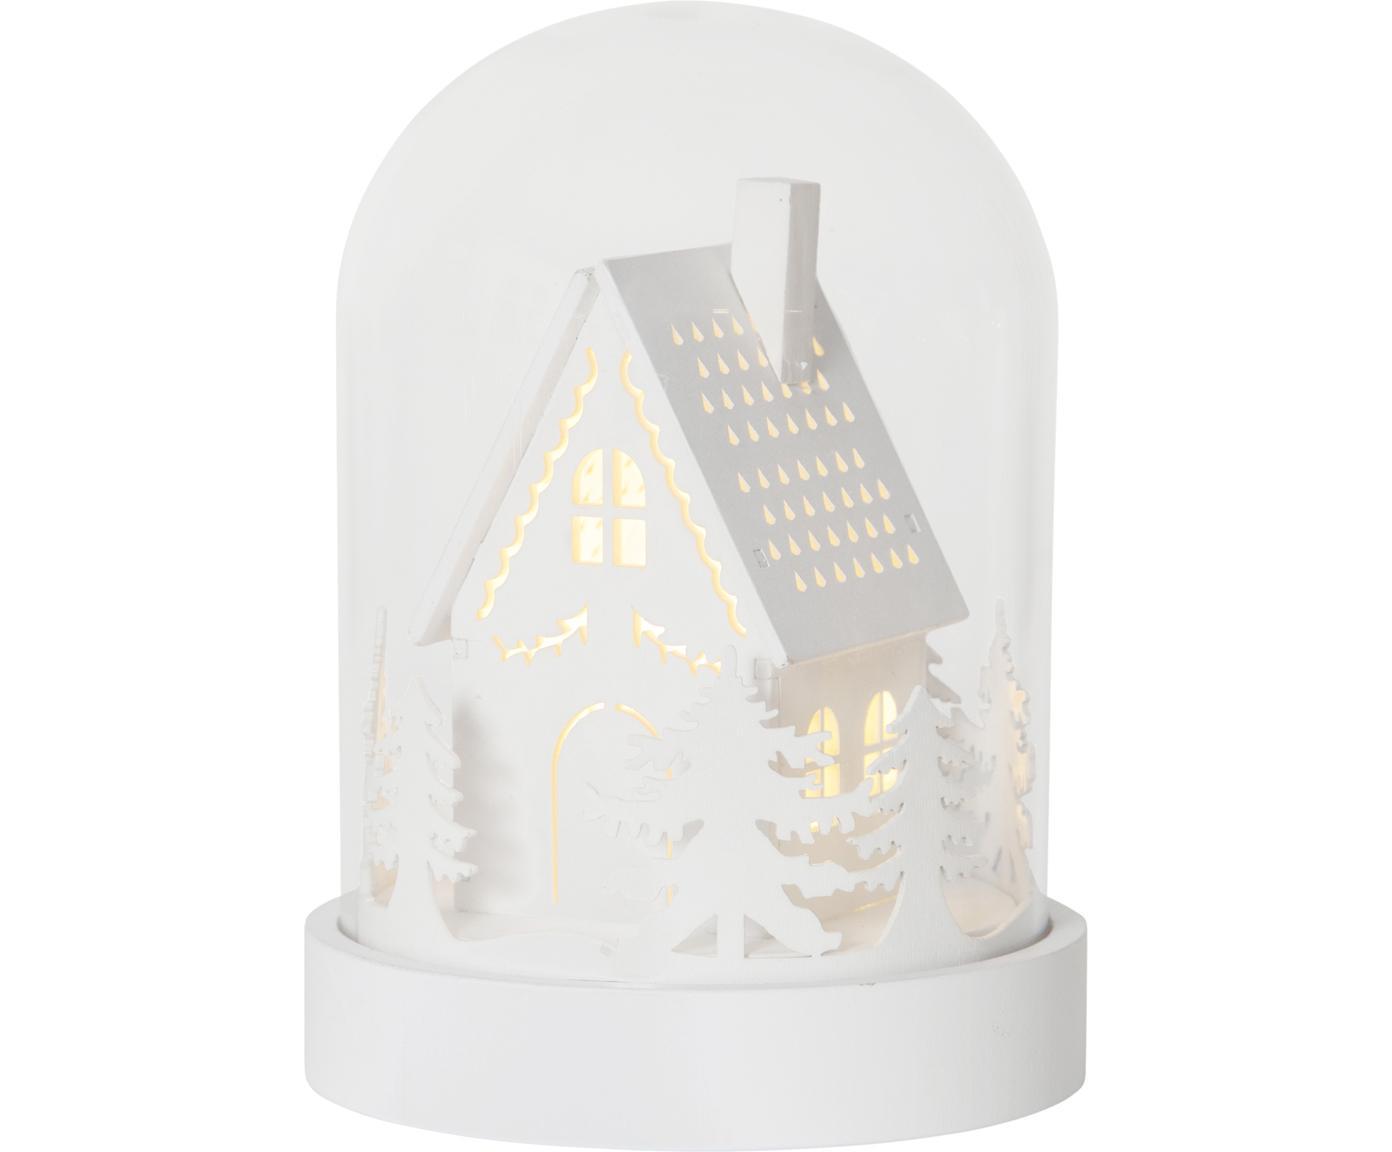 Objeto luminoso LED House, funciona a pilas, Tablero de fibras de densidad media (MDF), plástico, vidrio, Blanco, transparente, Ø 13 x Al 18 cm